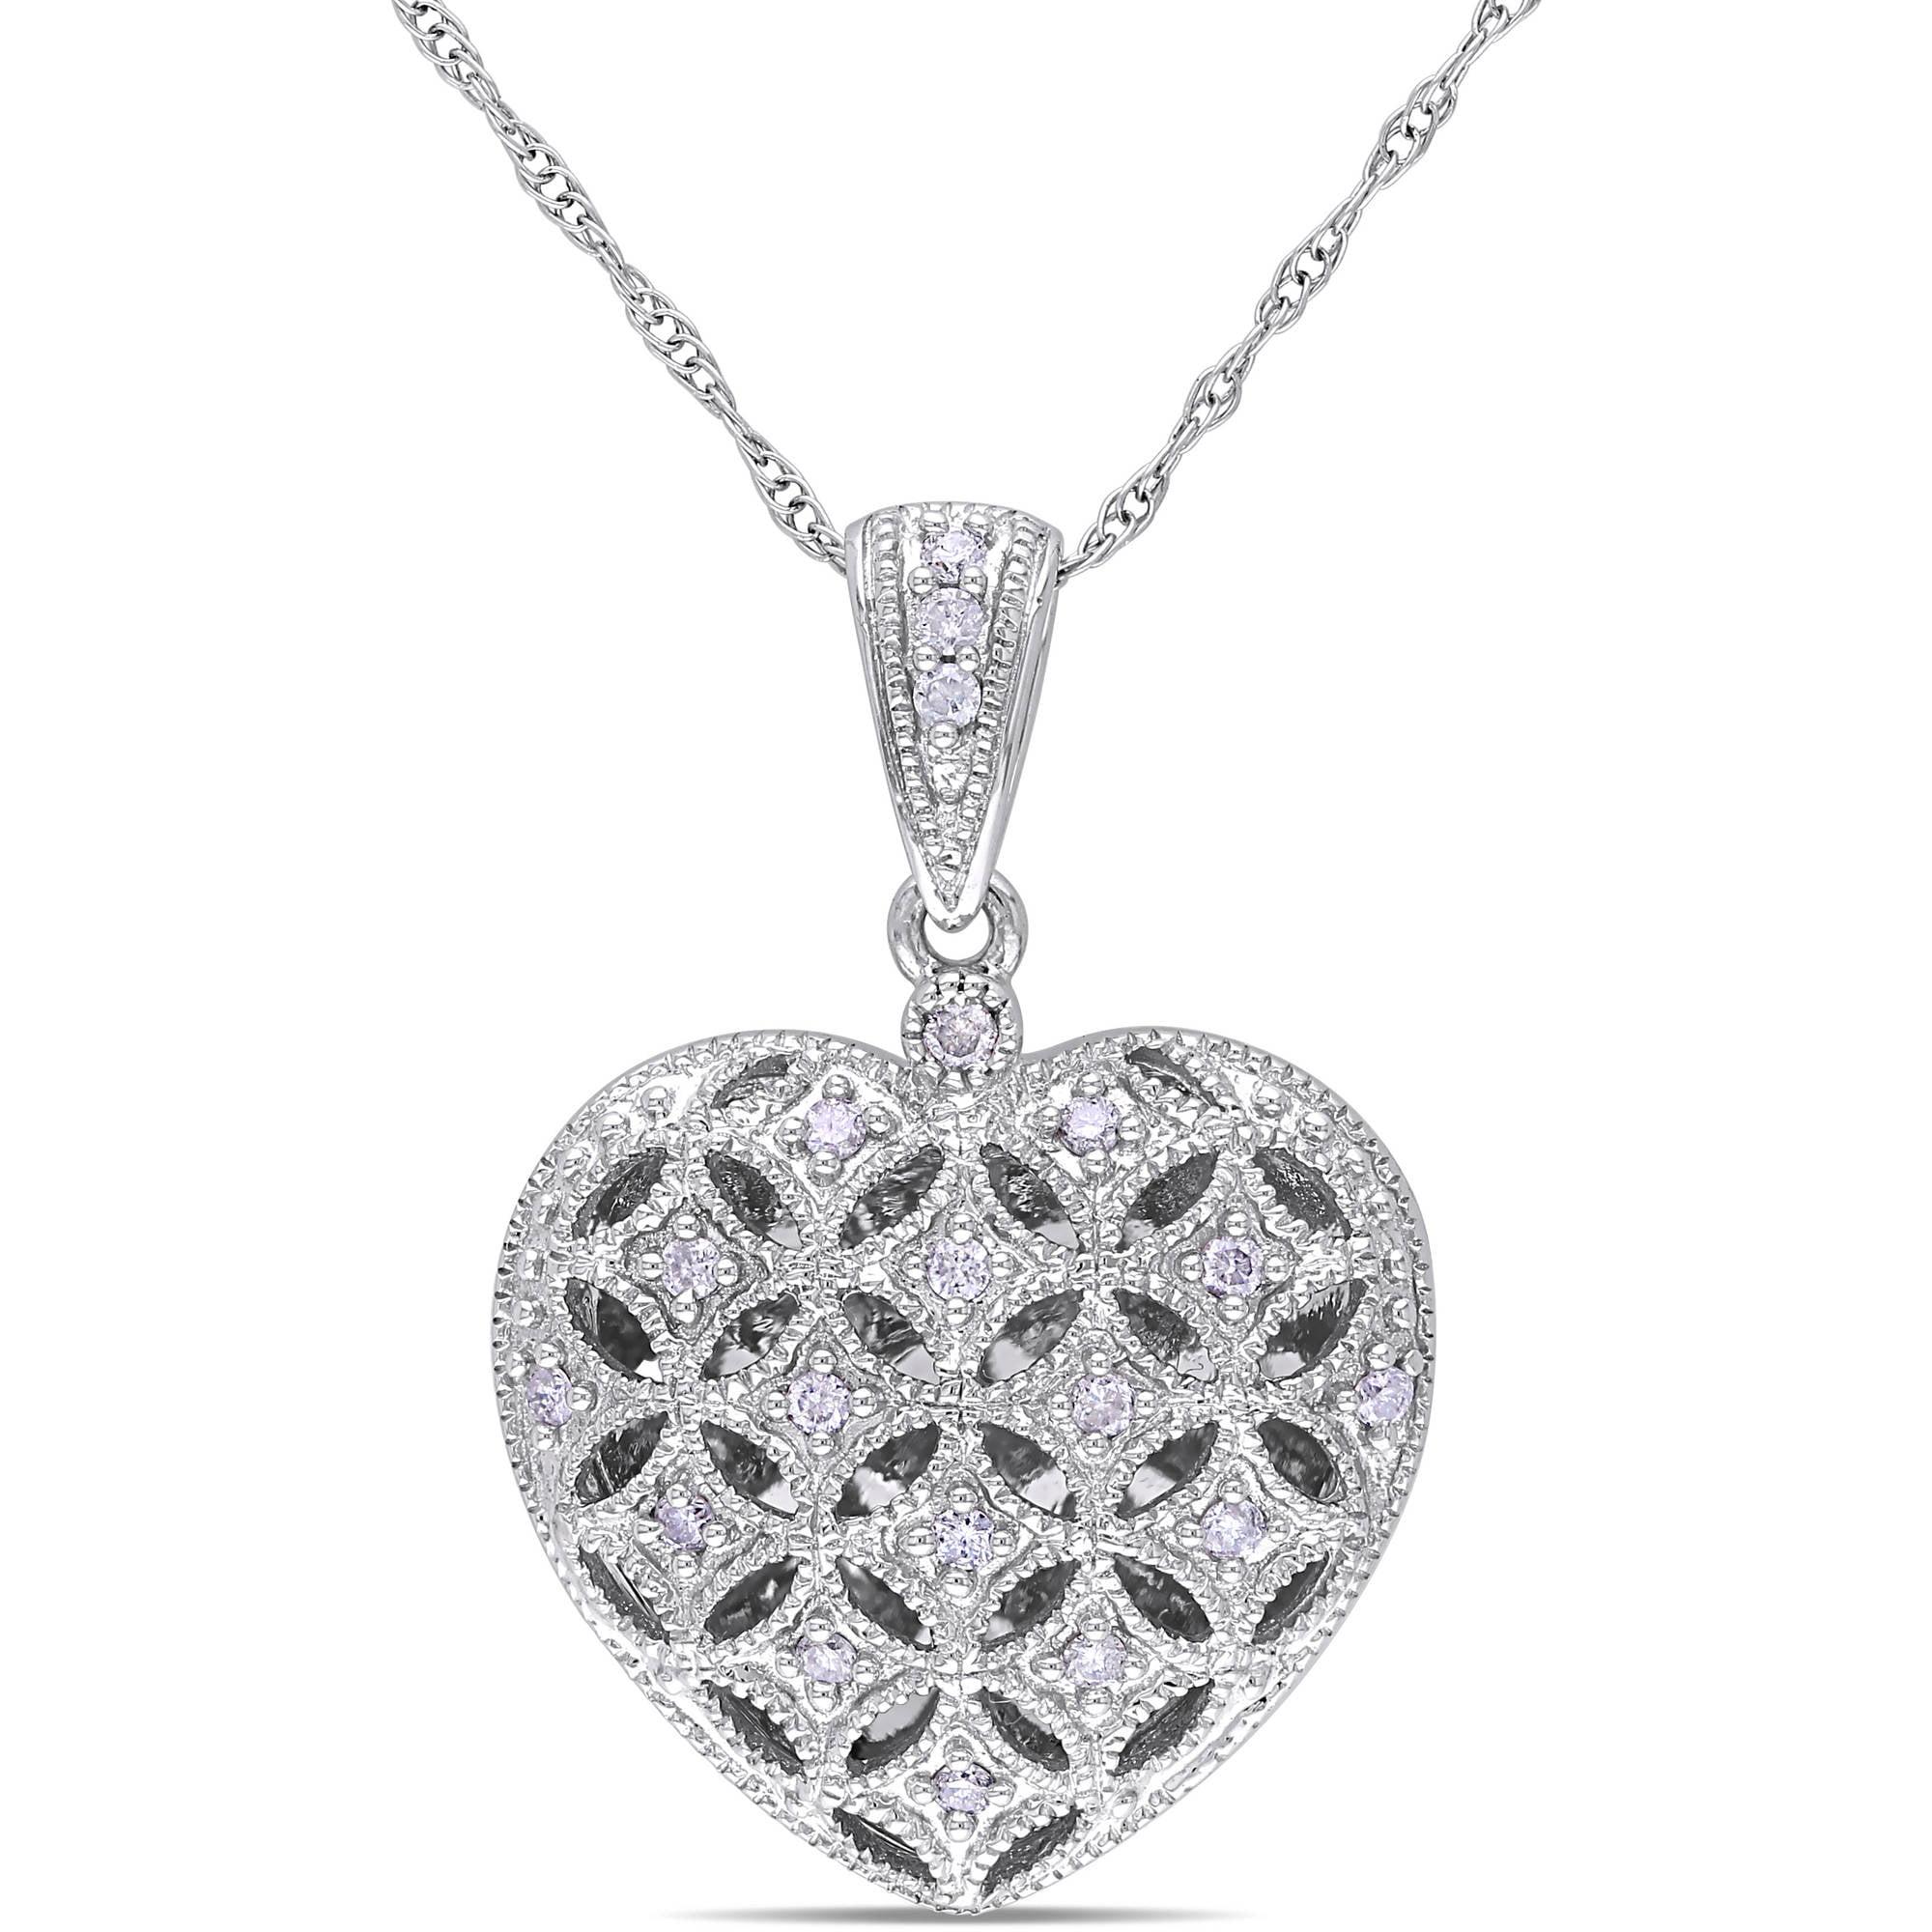 "Miabella 1 7 Carat T.W. Diamond 10kt White Gold Heart Locket Pendant, 17"" by Delmar Manufacturing LLC"